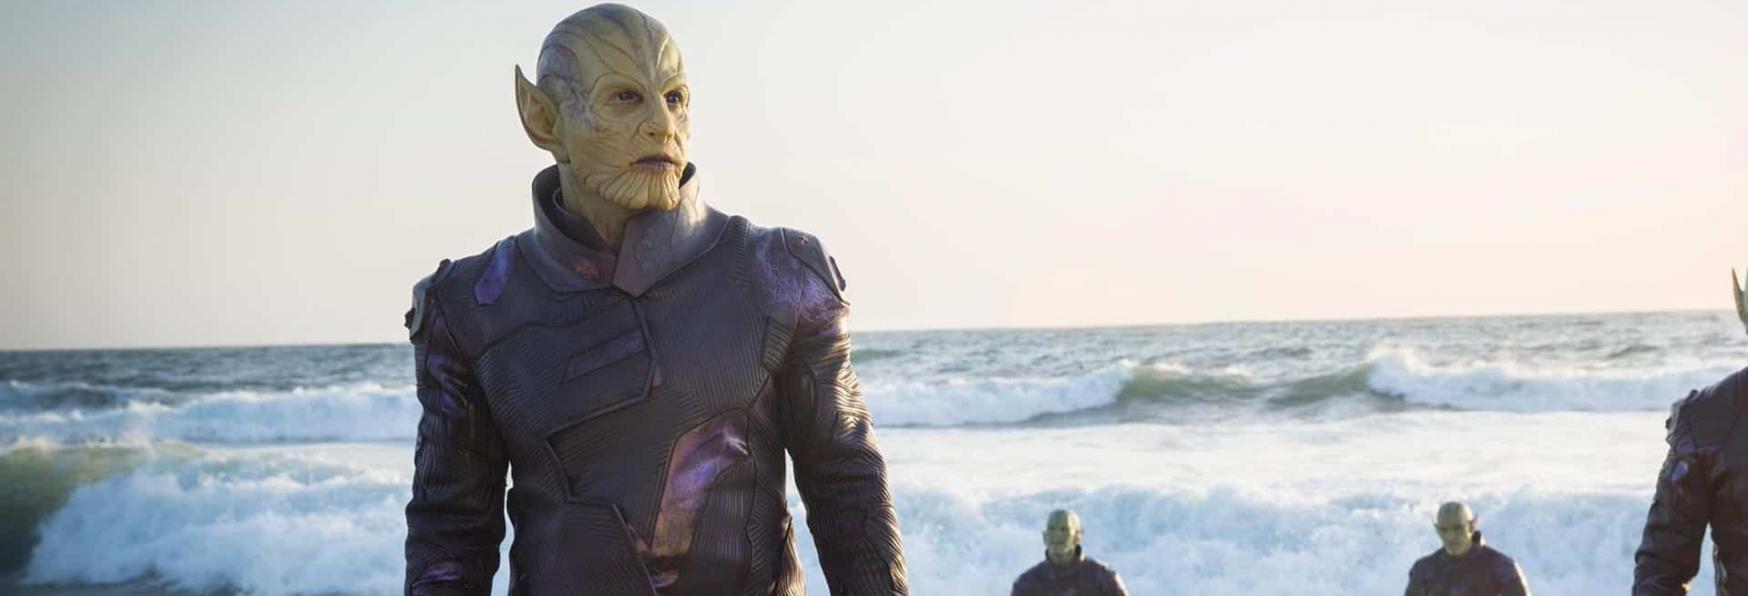 Secret Invasion: Kingsley Ben-Adir farà parte del Cast della Serie TV Marvel